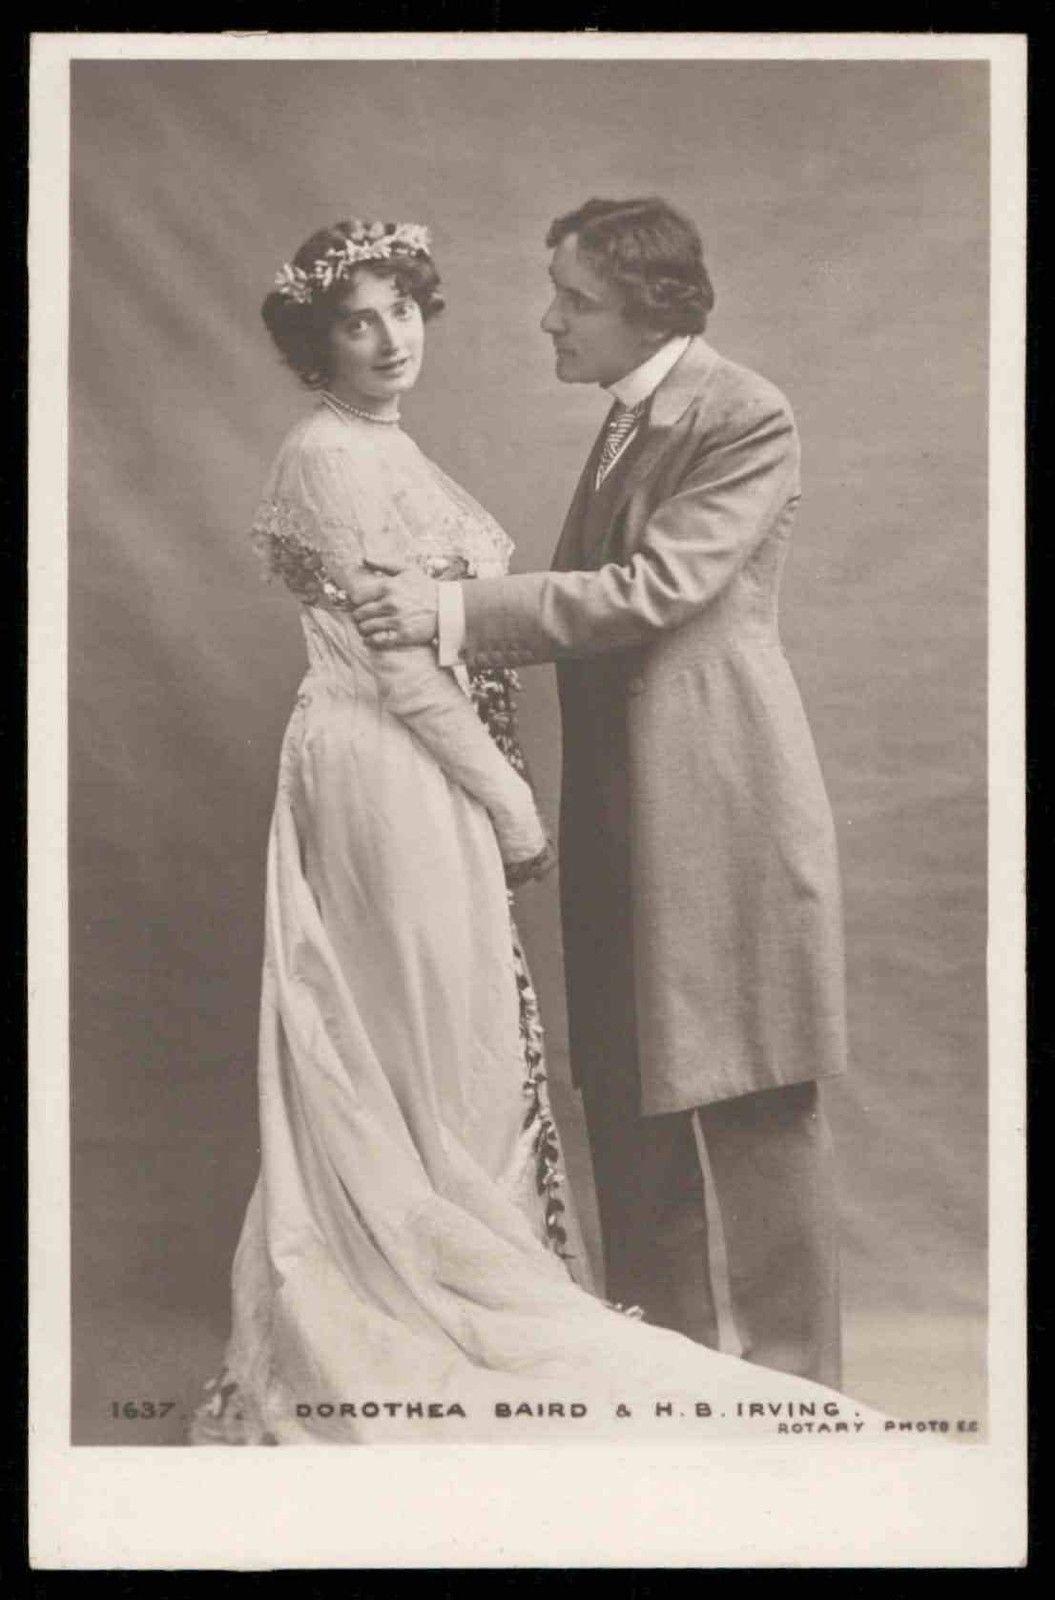 Edwardian love Romance couple Rhymes original 1910s Photo